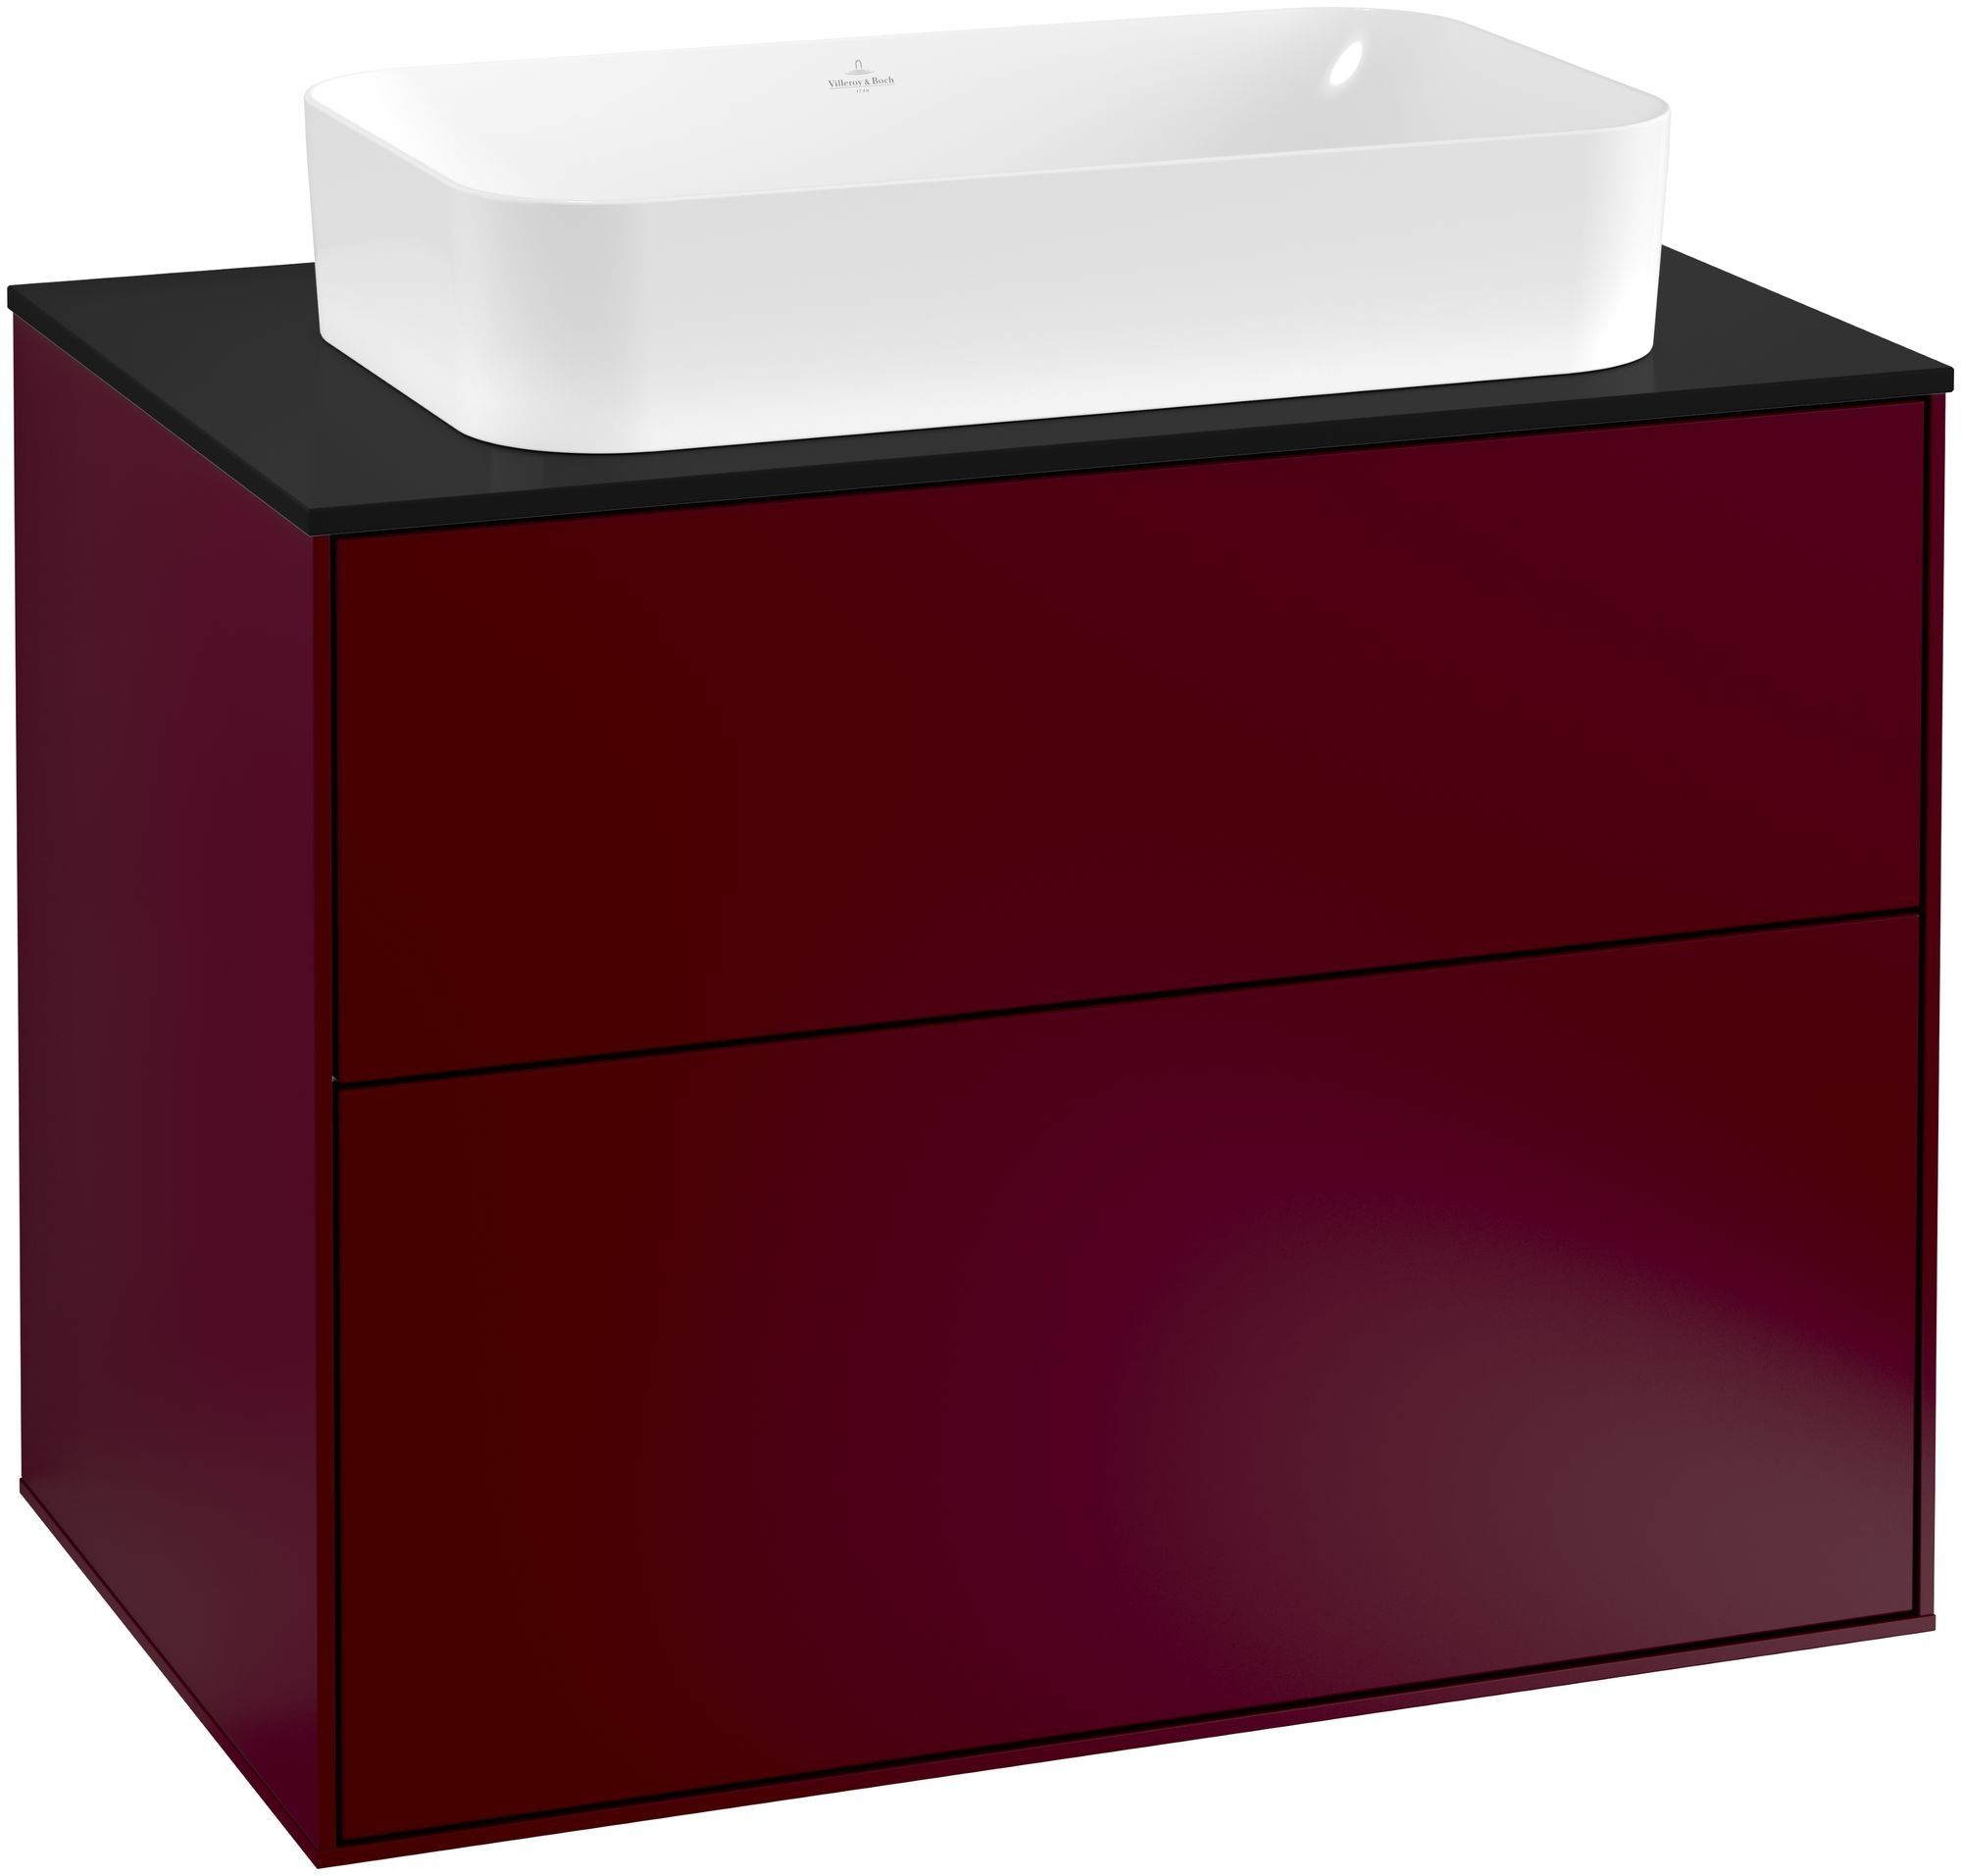 Villeroy & Boch Finion G22 Waschtischunterschrank 2 Auszüge Waschtisch mittig LED-Beleuchtung B:80xH:60,3xT:50,1cm Front, Korpus: Peony, Glasplatte: Black Matt G22200HB